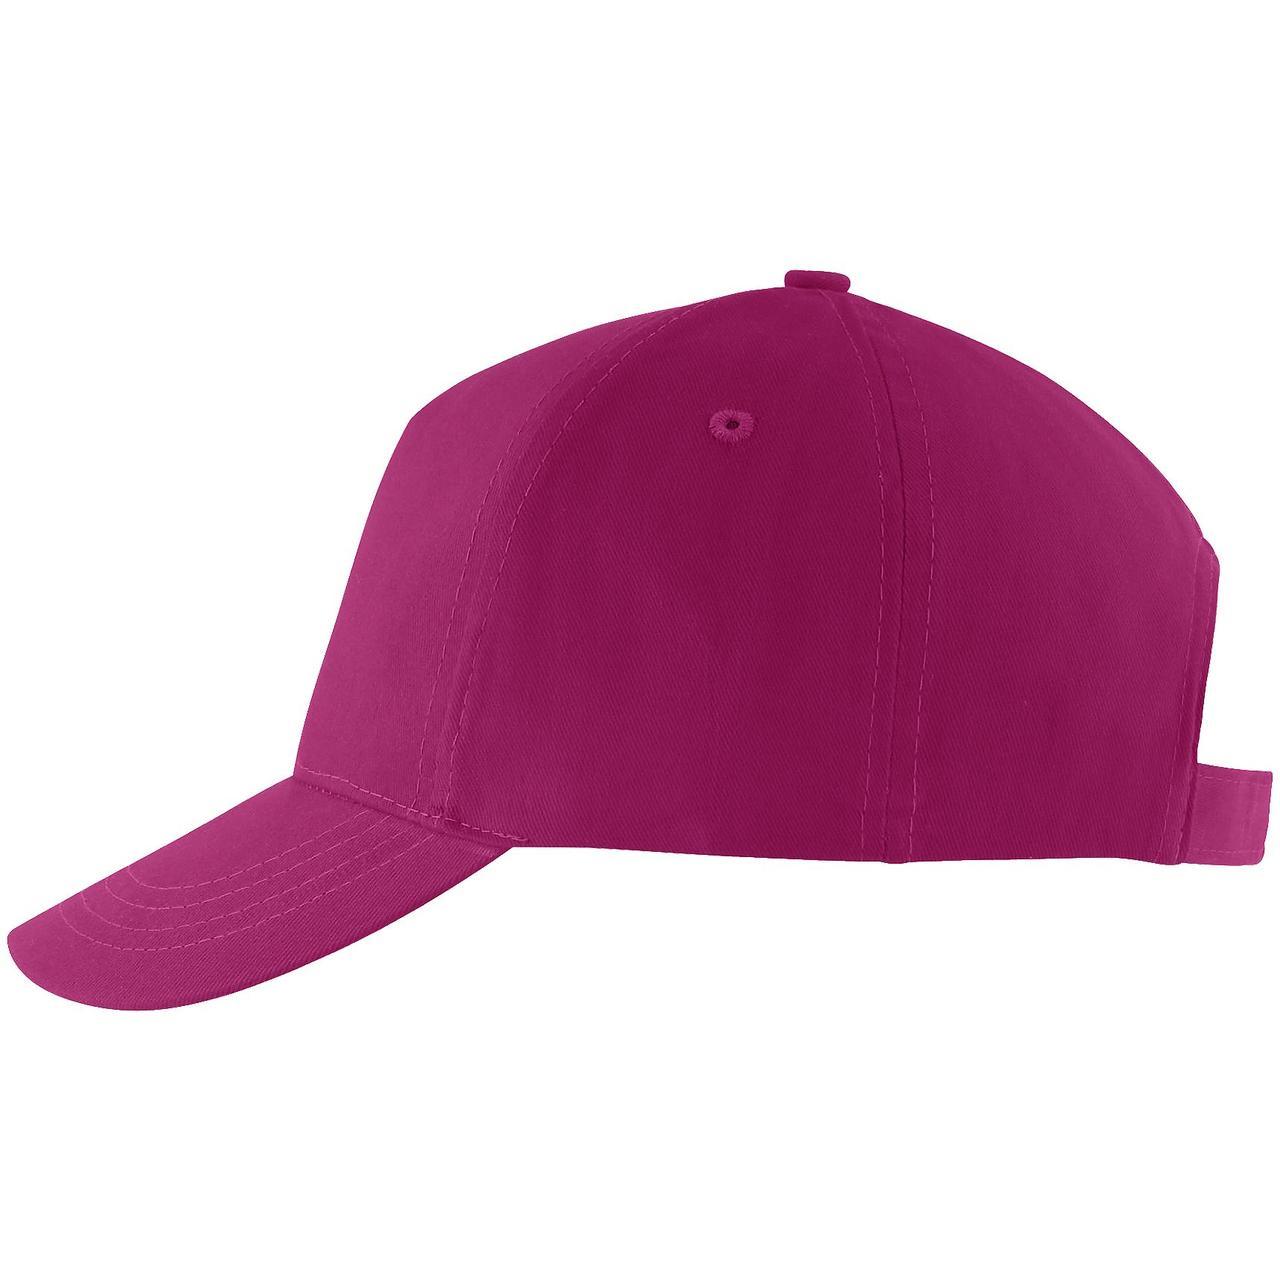 Бейсболка Buzz, ярко-розовая (фуксия) (артикул 6536.57)